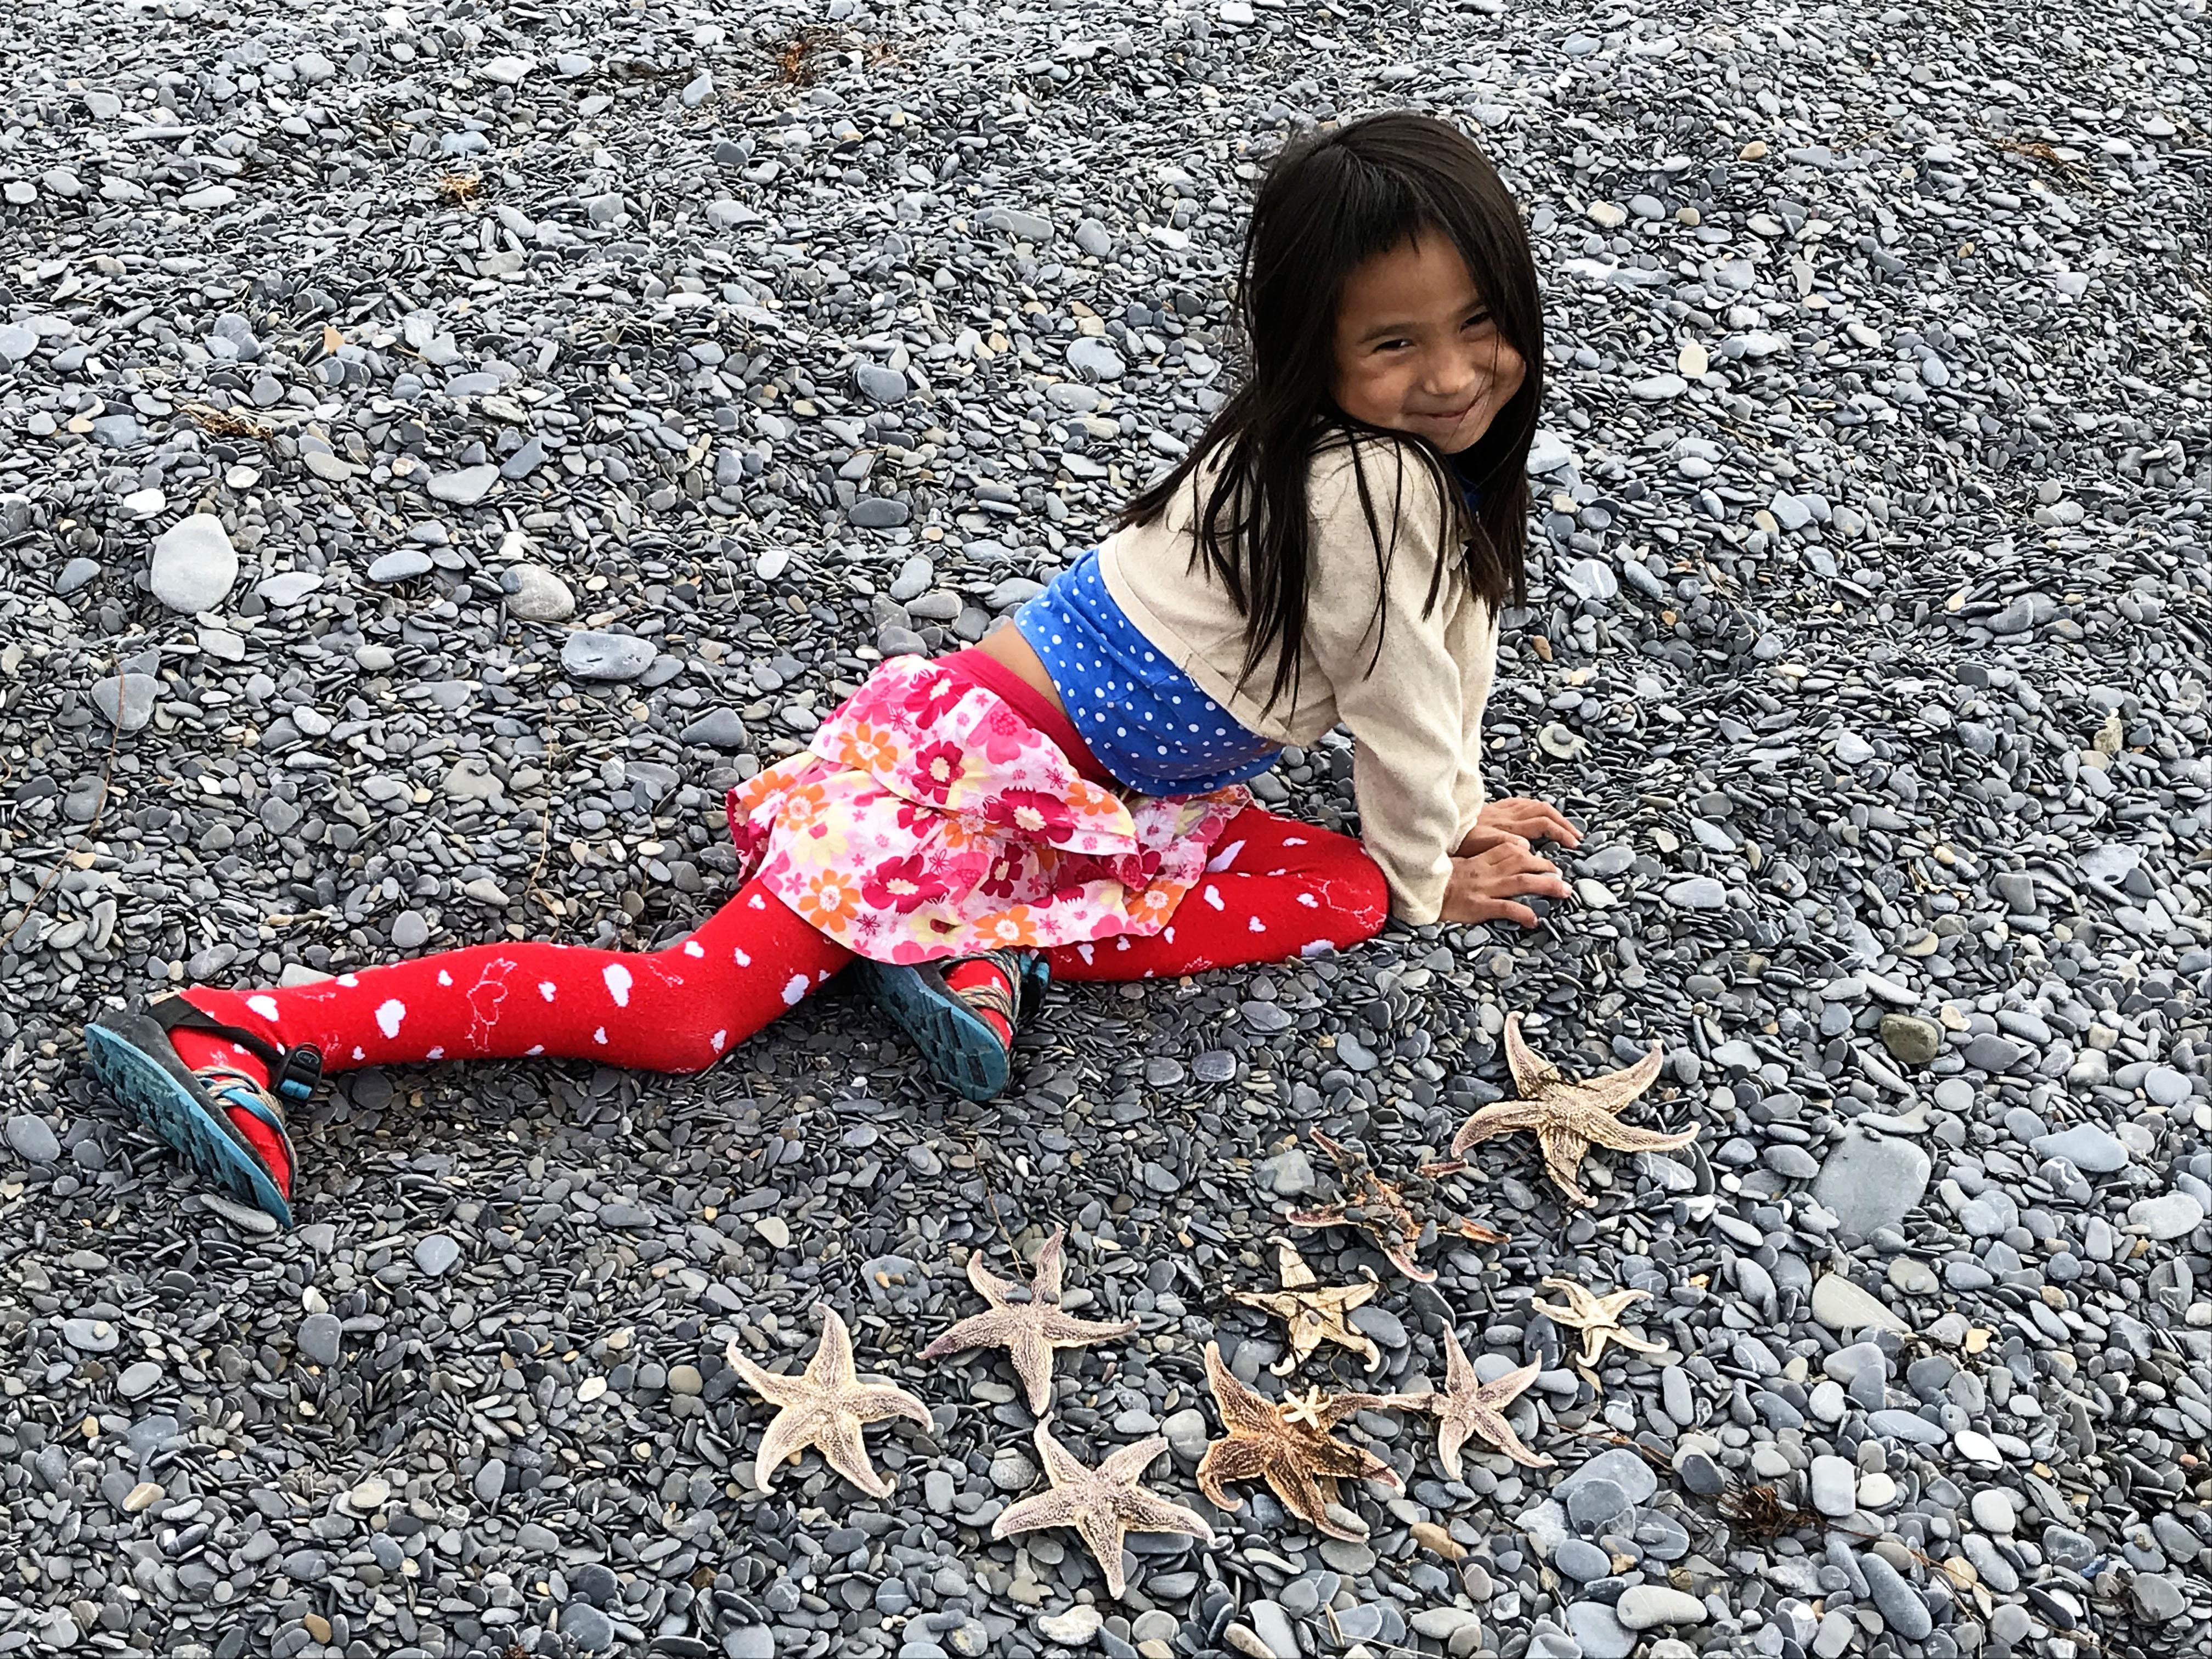 Back in the Alaska Bush Starfish Family